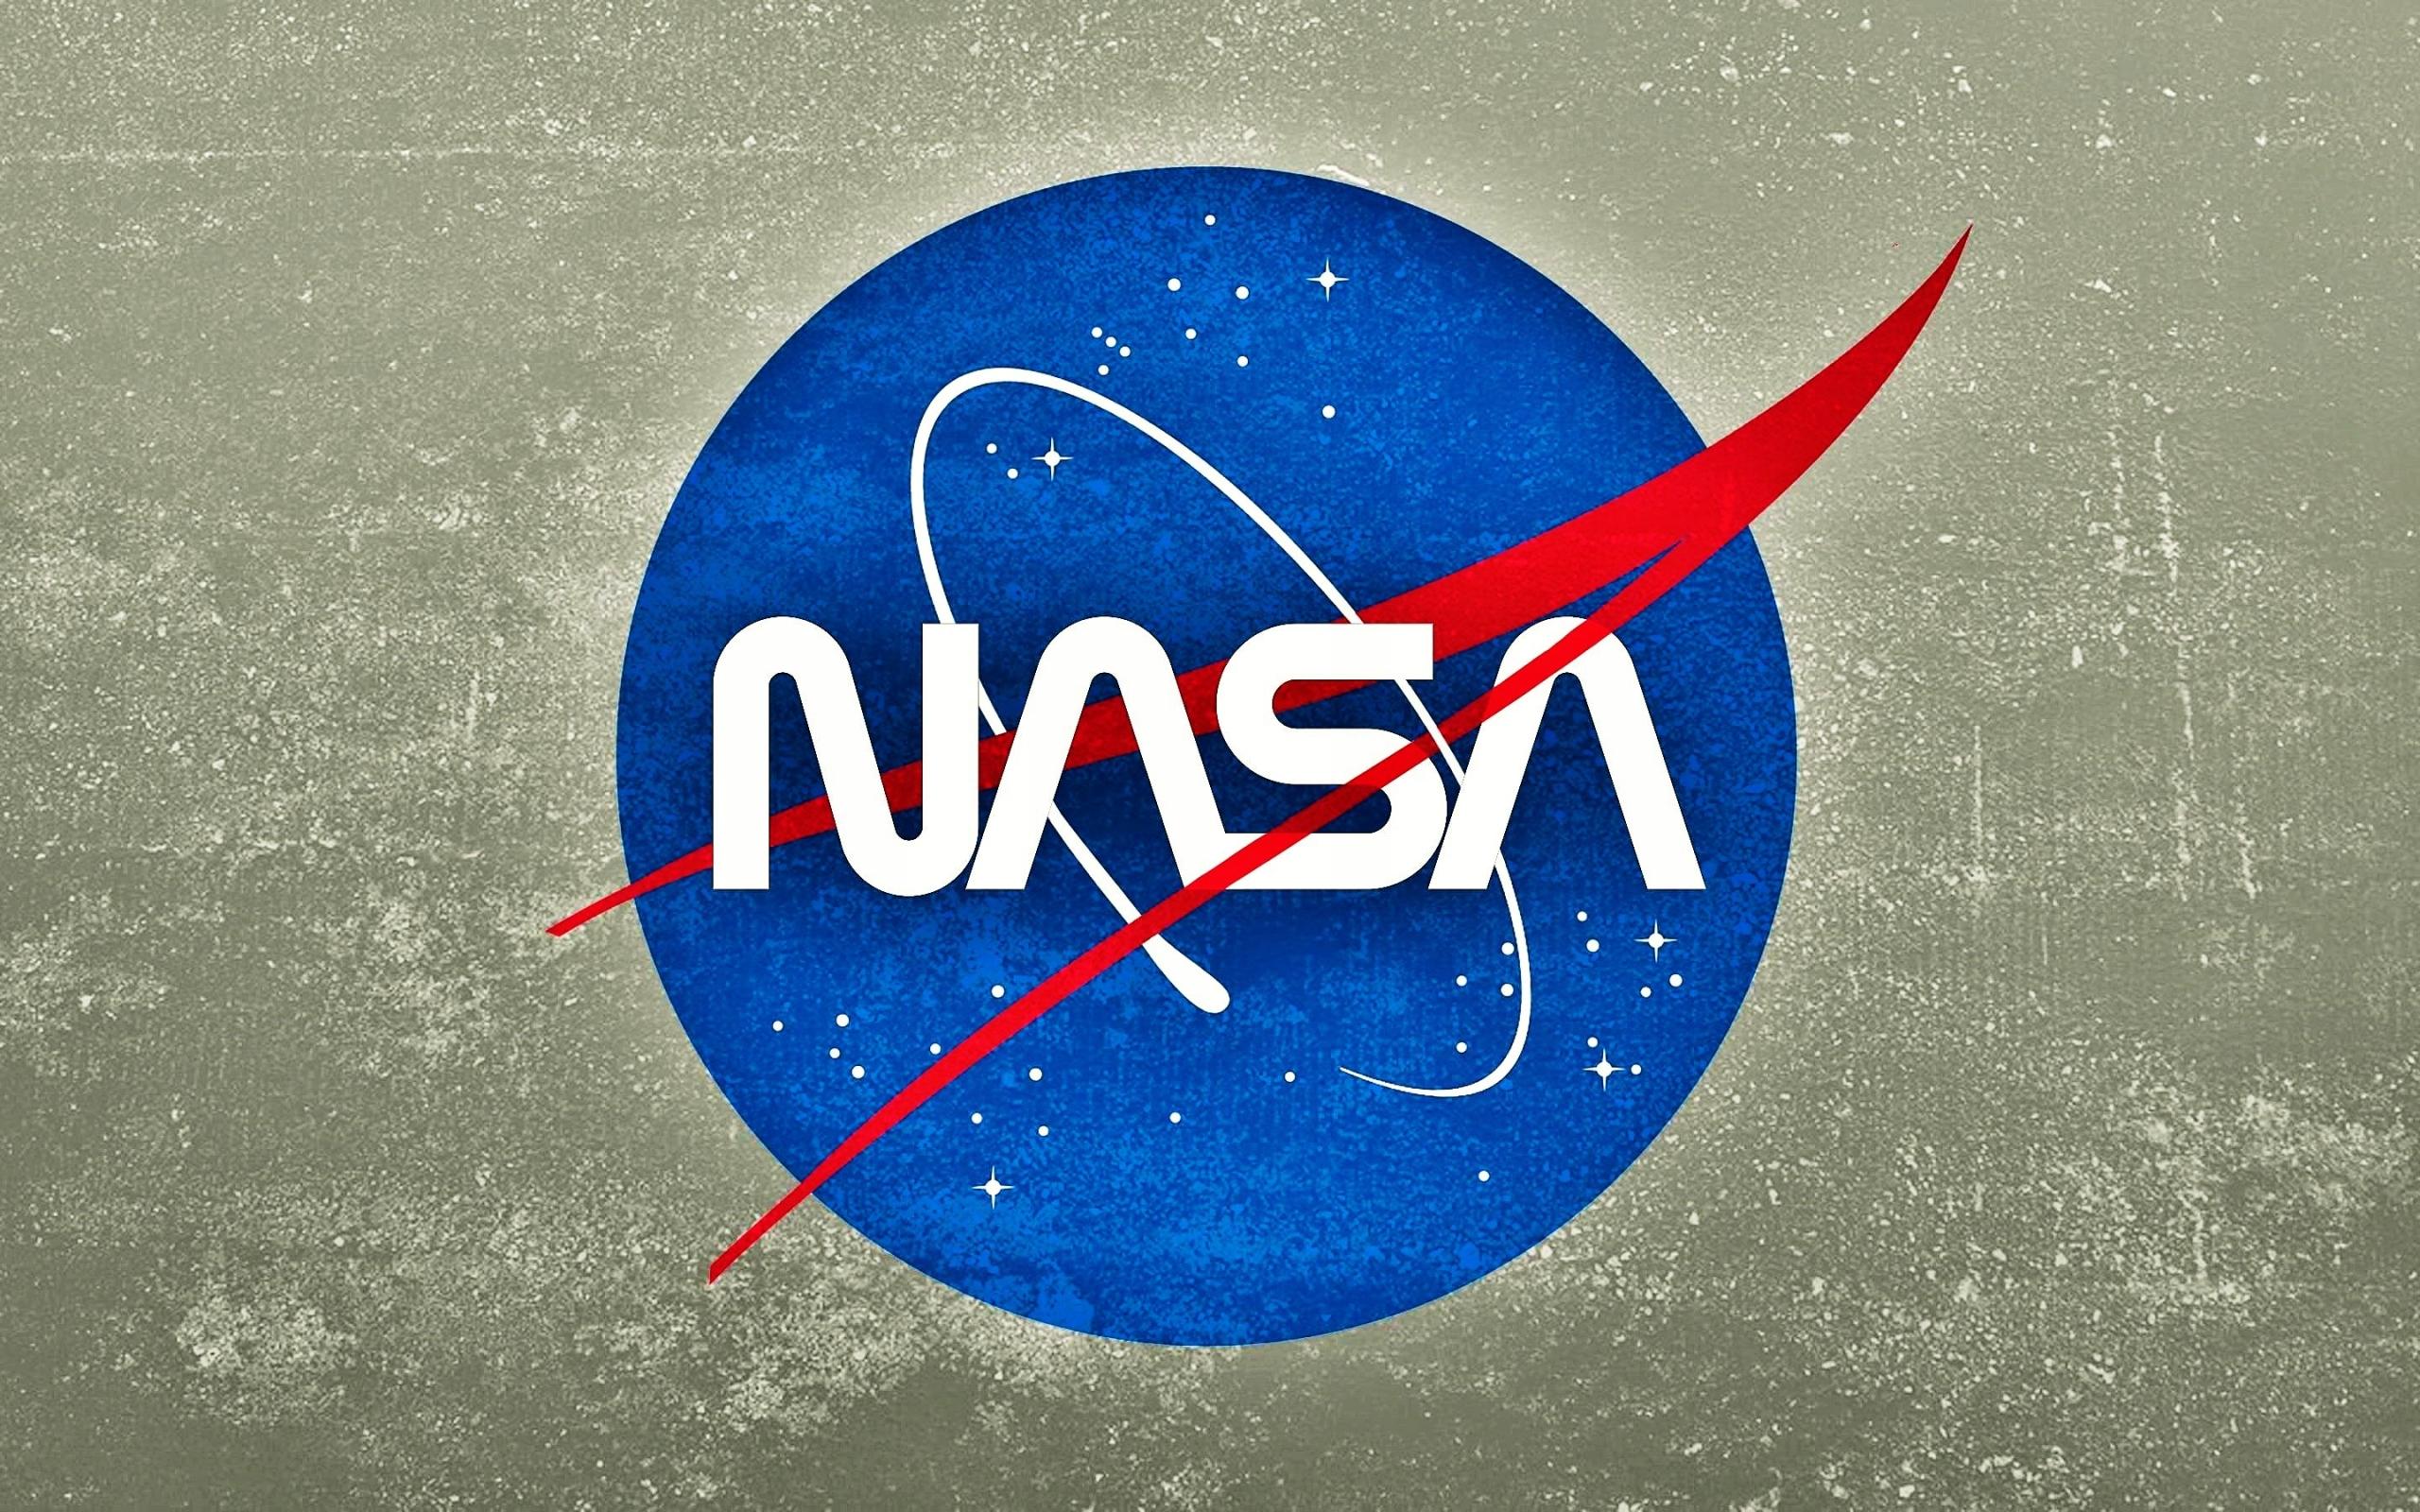 Nasa Kosmos Super Plakaty Ultra Hd 4k 420x300 Mm